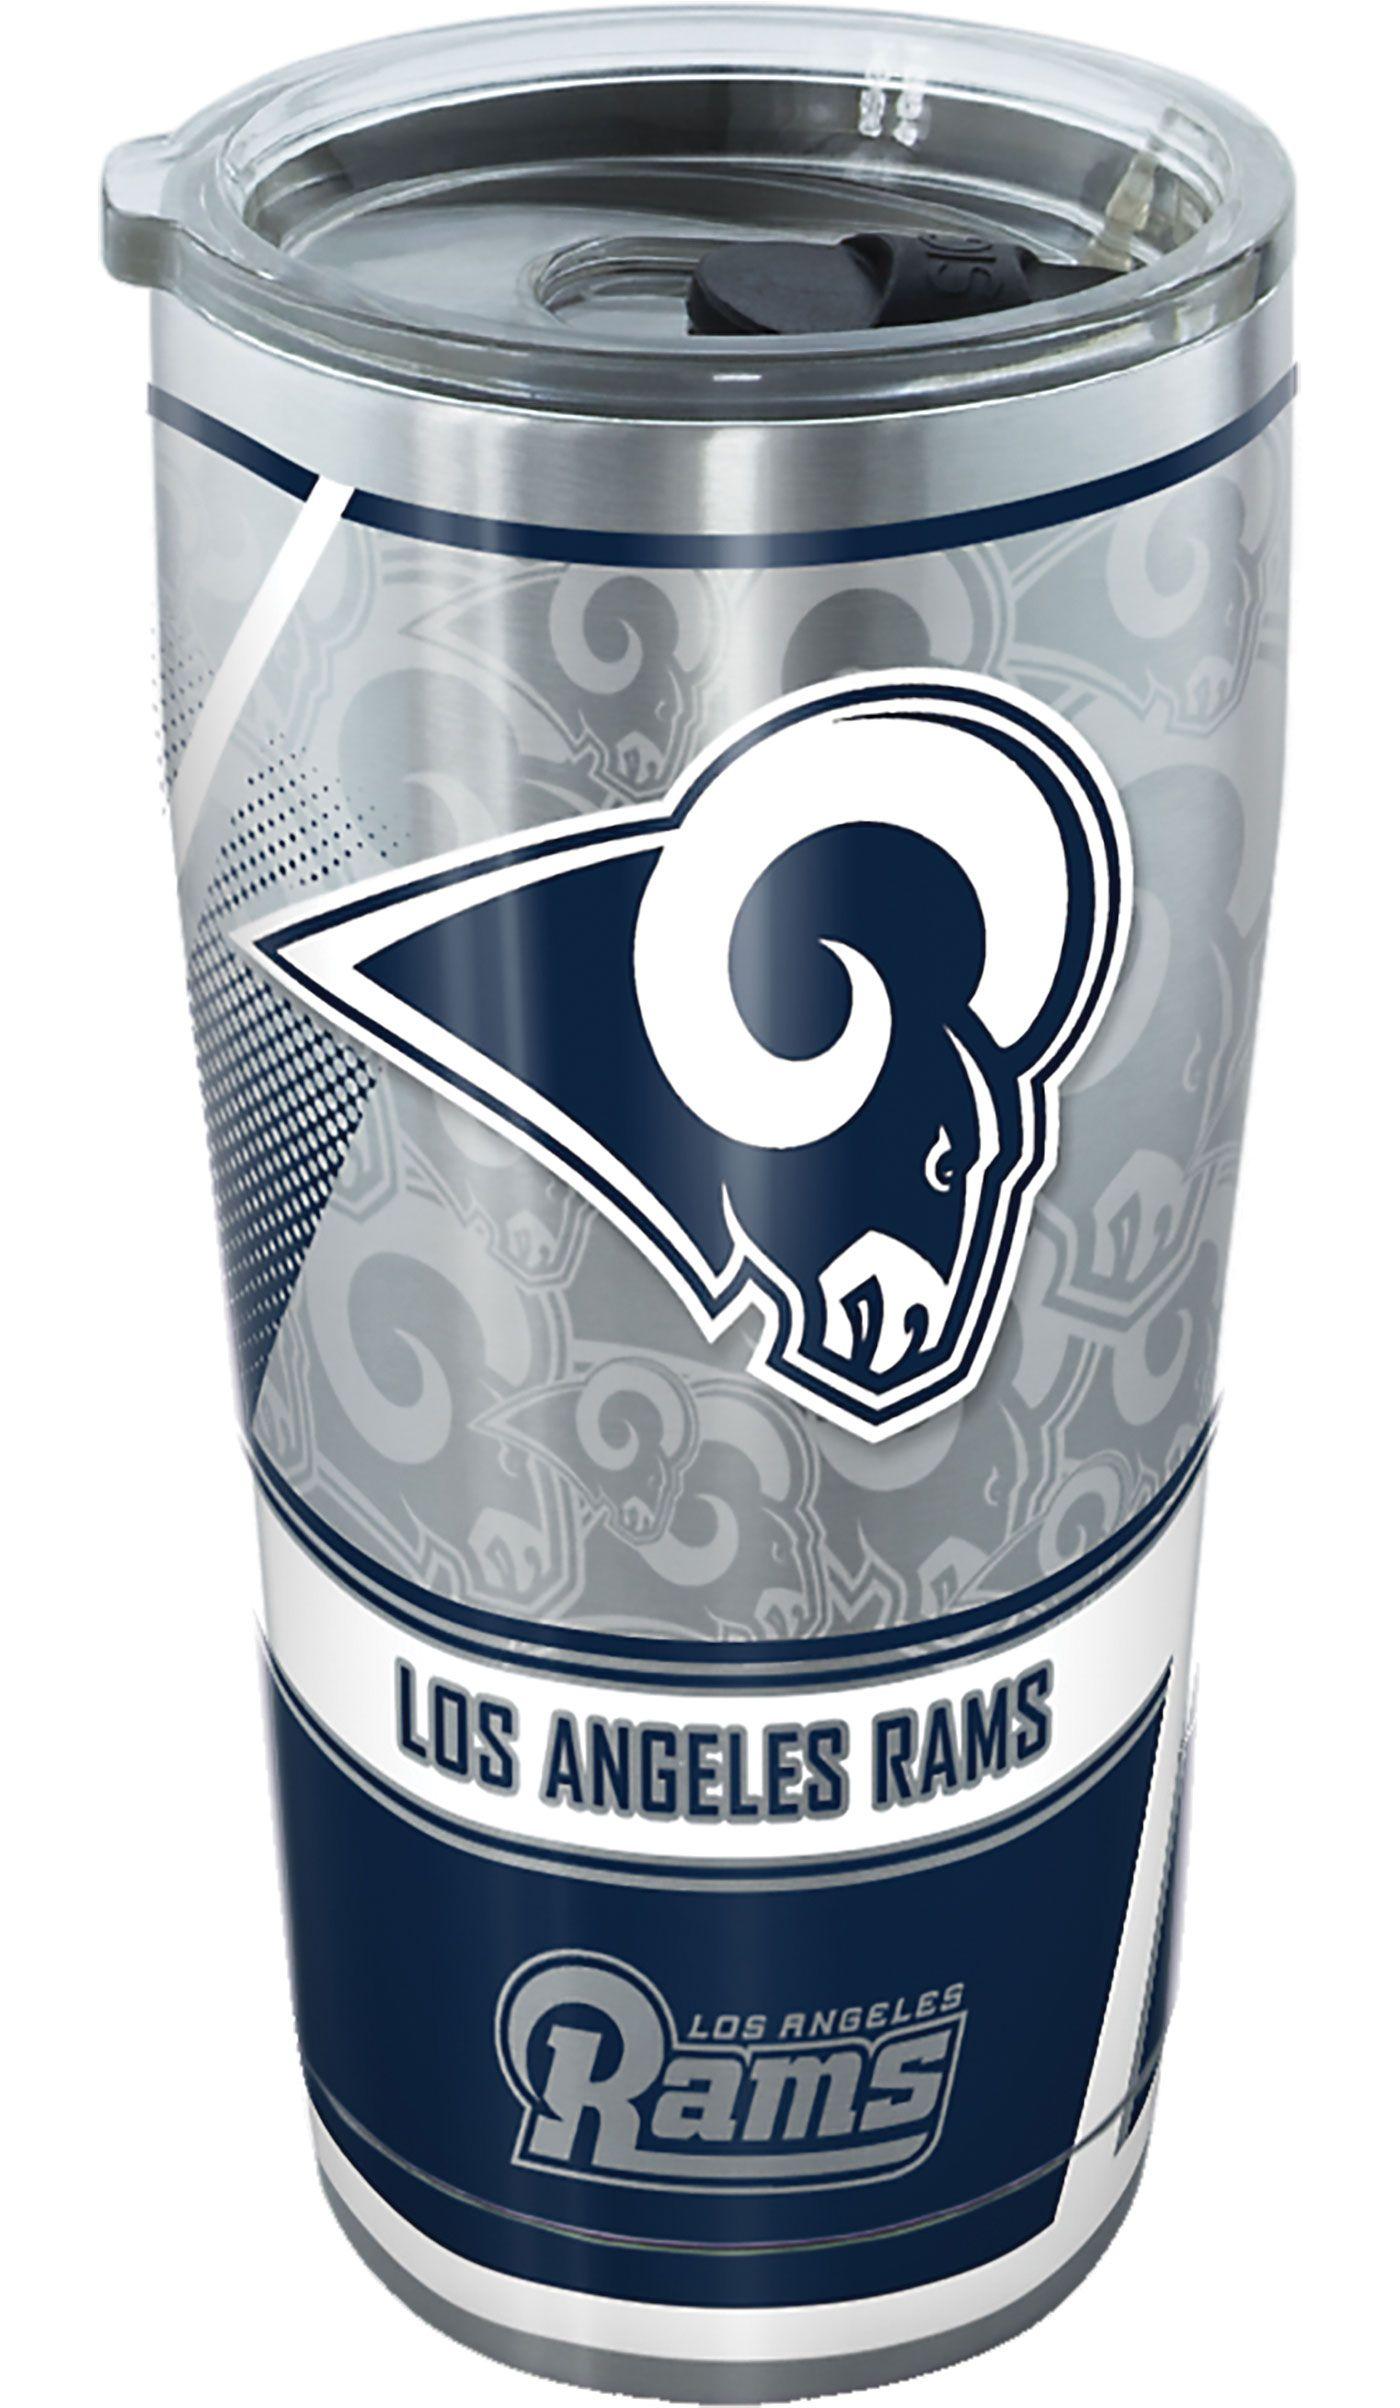 Tervis Los Angeles Rams 20oz. Edge Stainless Steel Tumbler